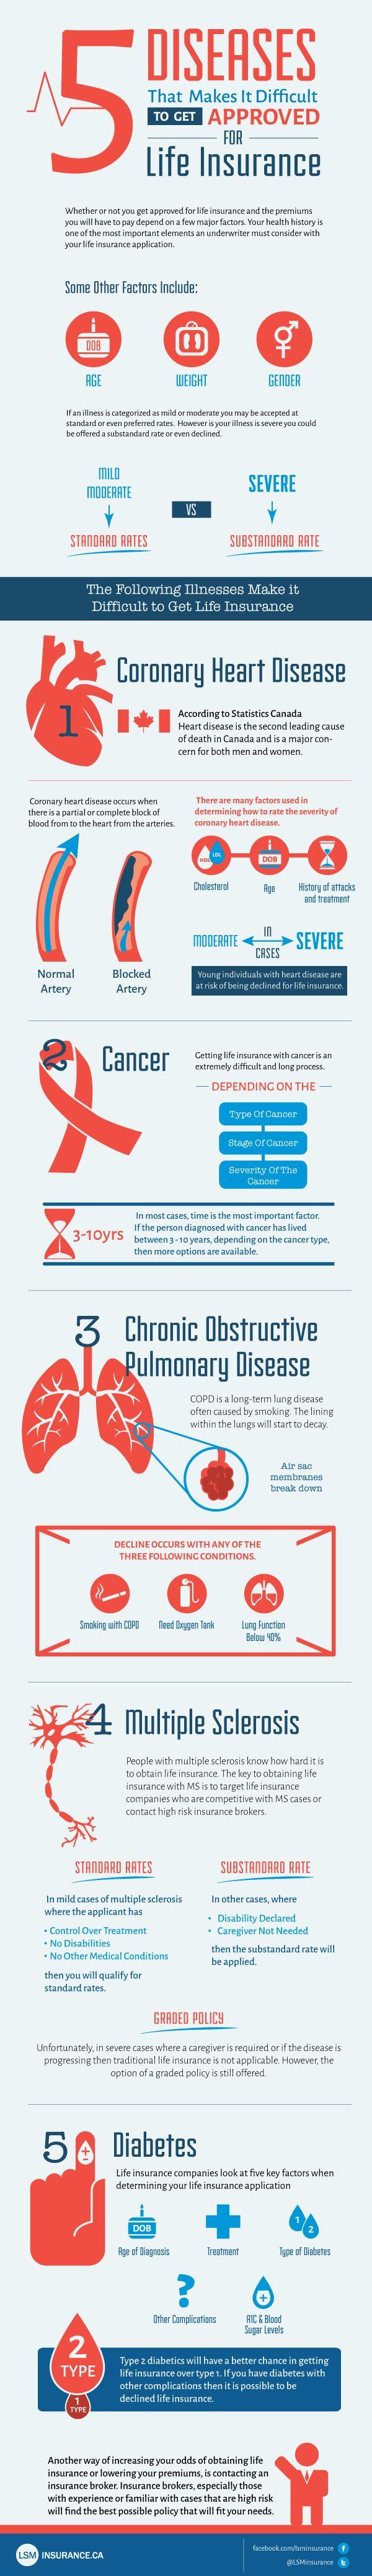 5 Diseases That Make It Hard To Get Life Insurance Disease